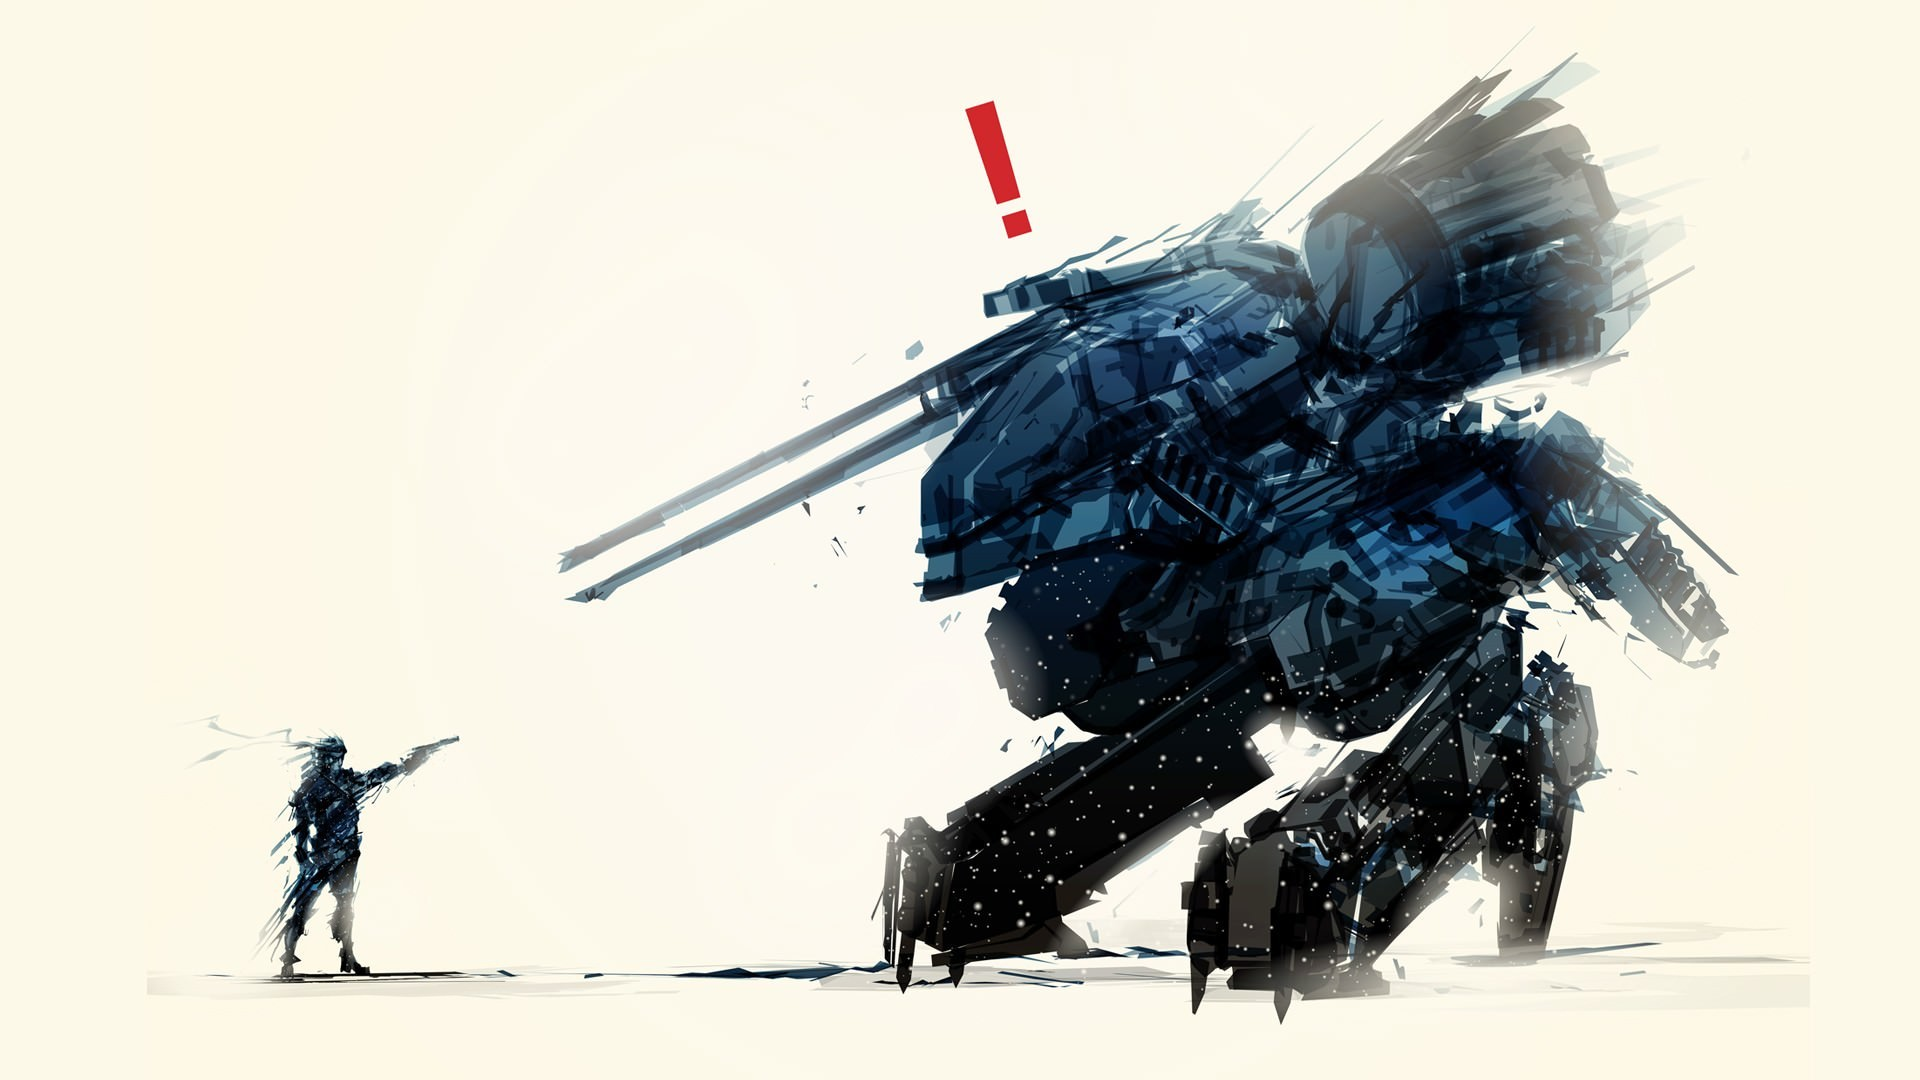 Metal Gear Solid Wallpapers Wallpapertag